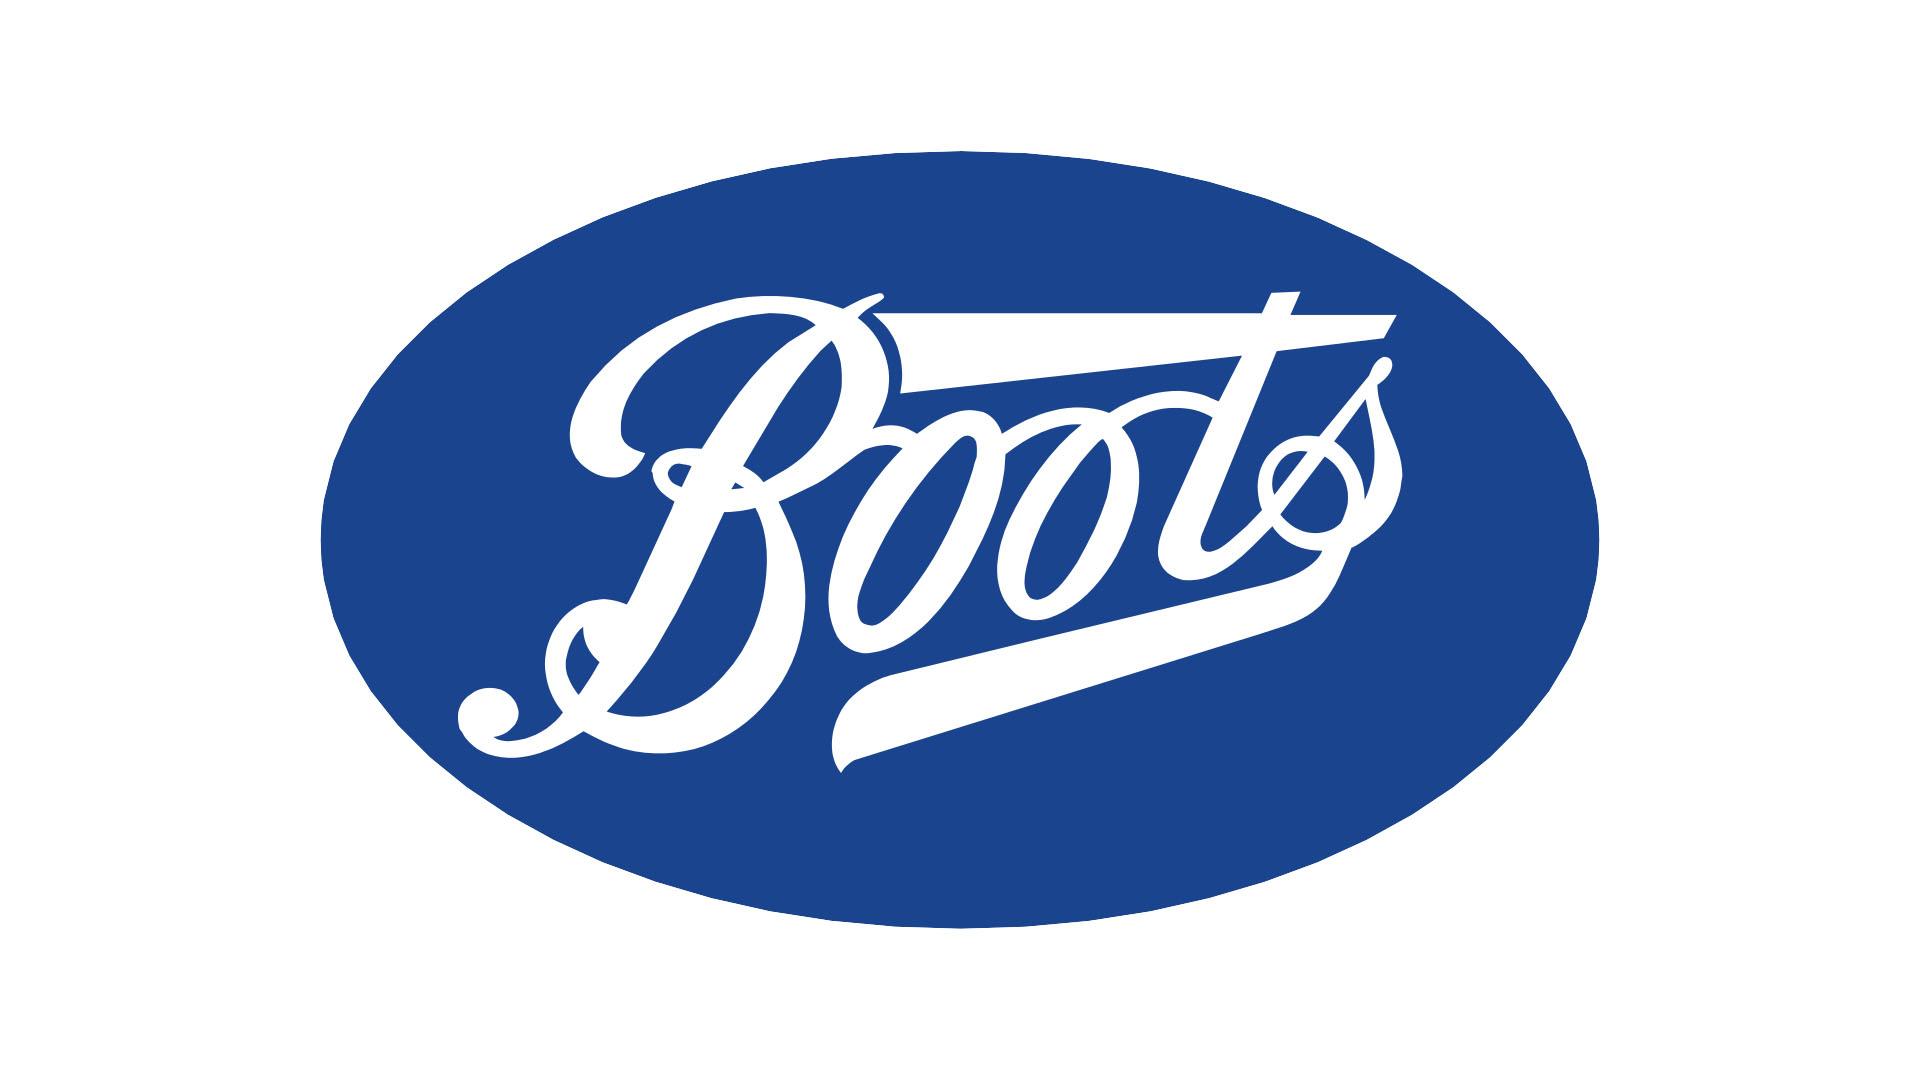 logo member boots